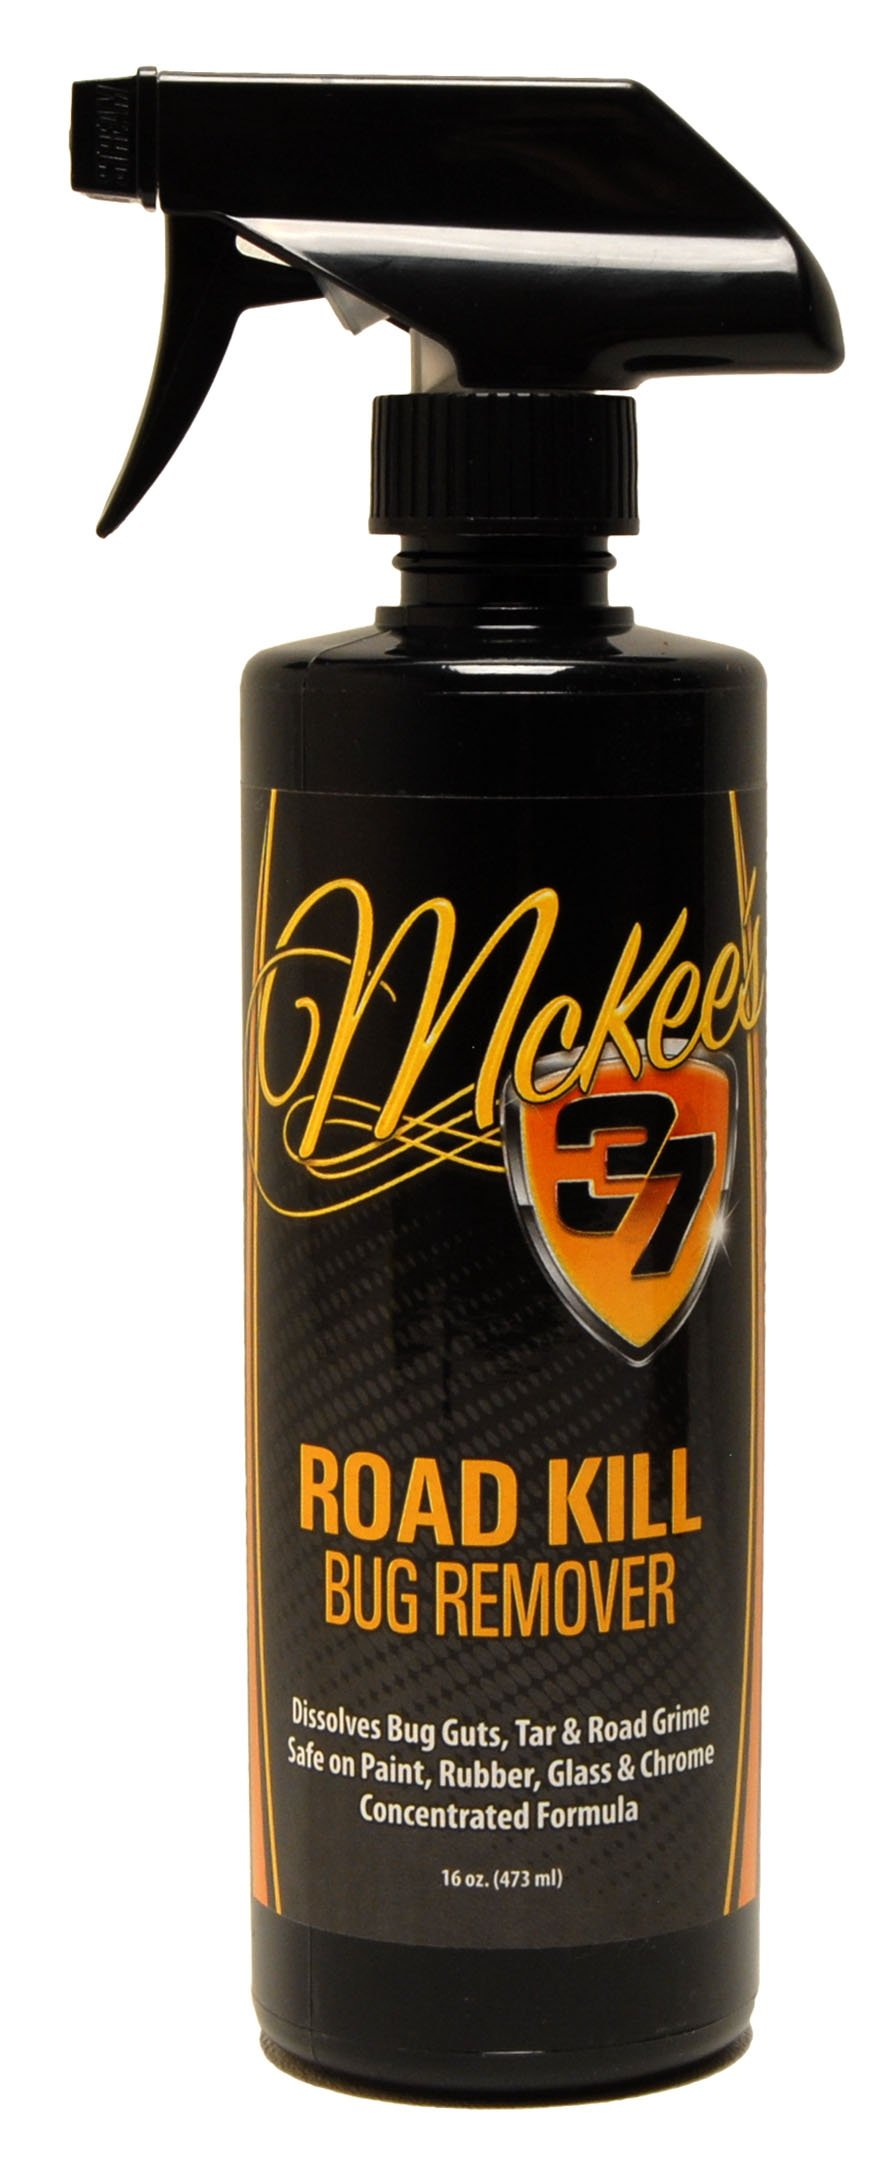 McKees 37 MK37 100 Remover Fluid_Ounces